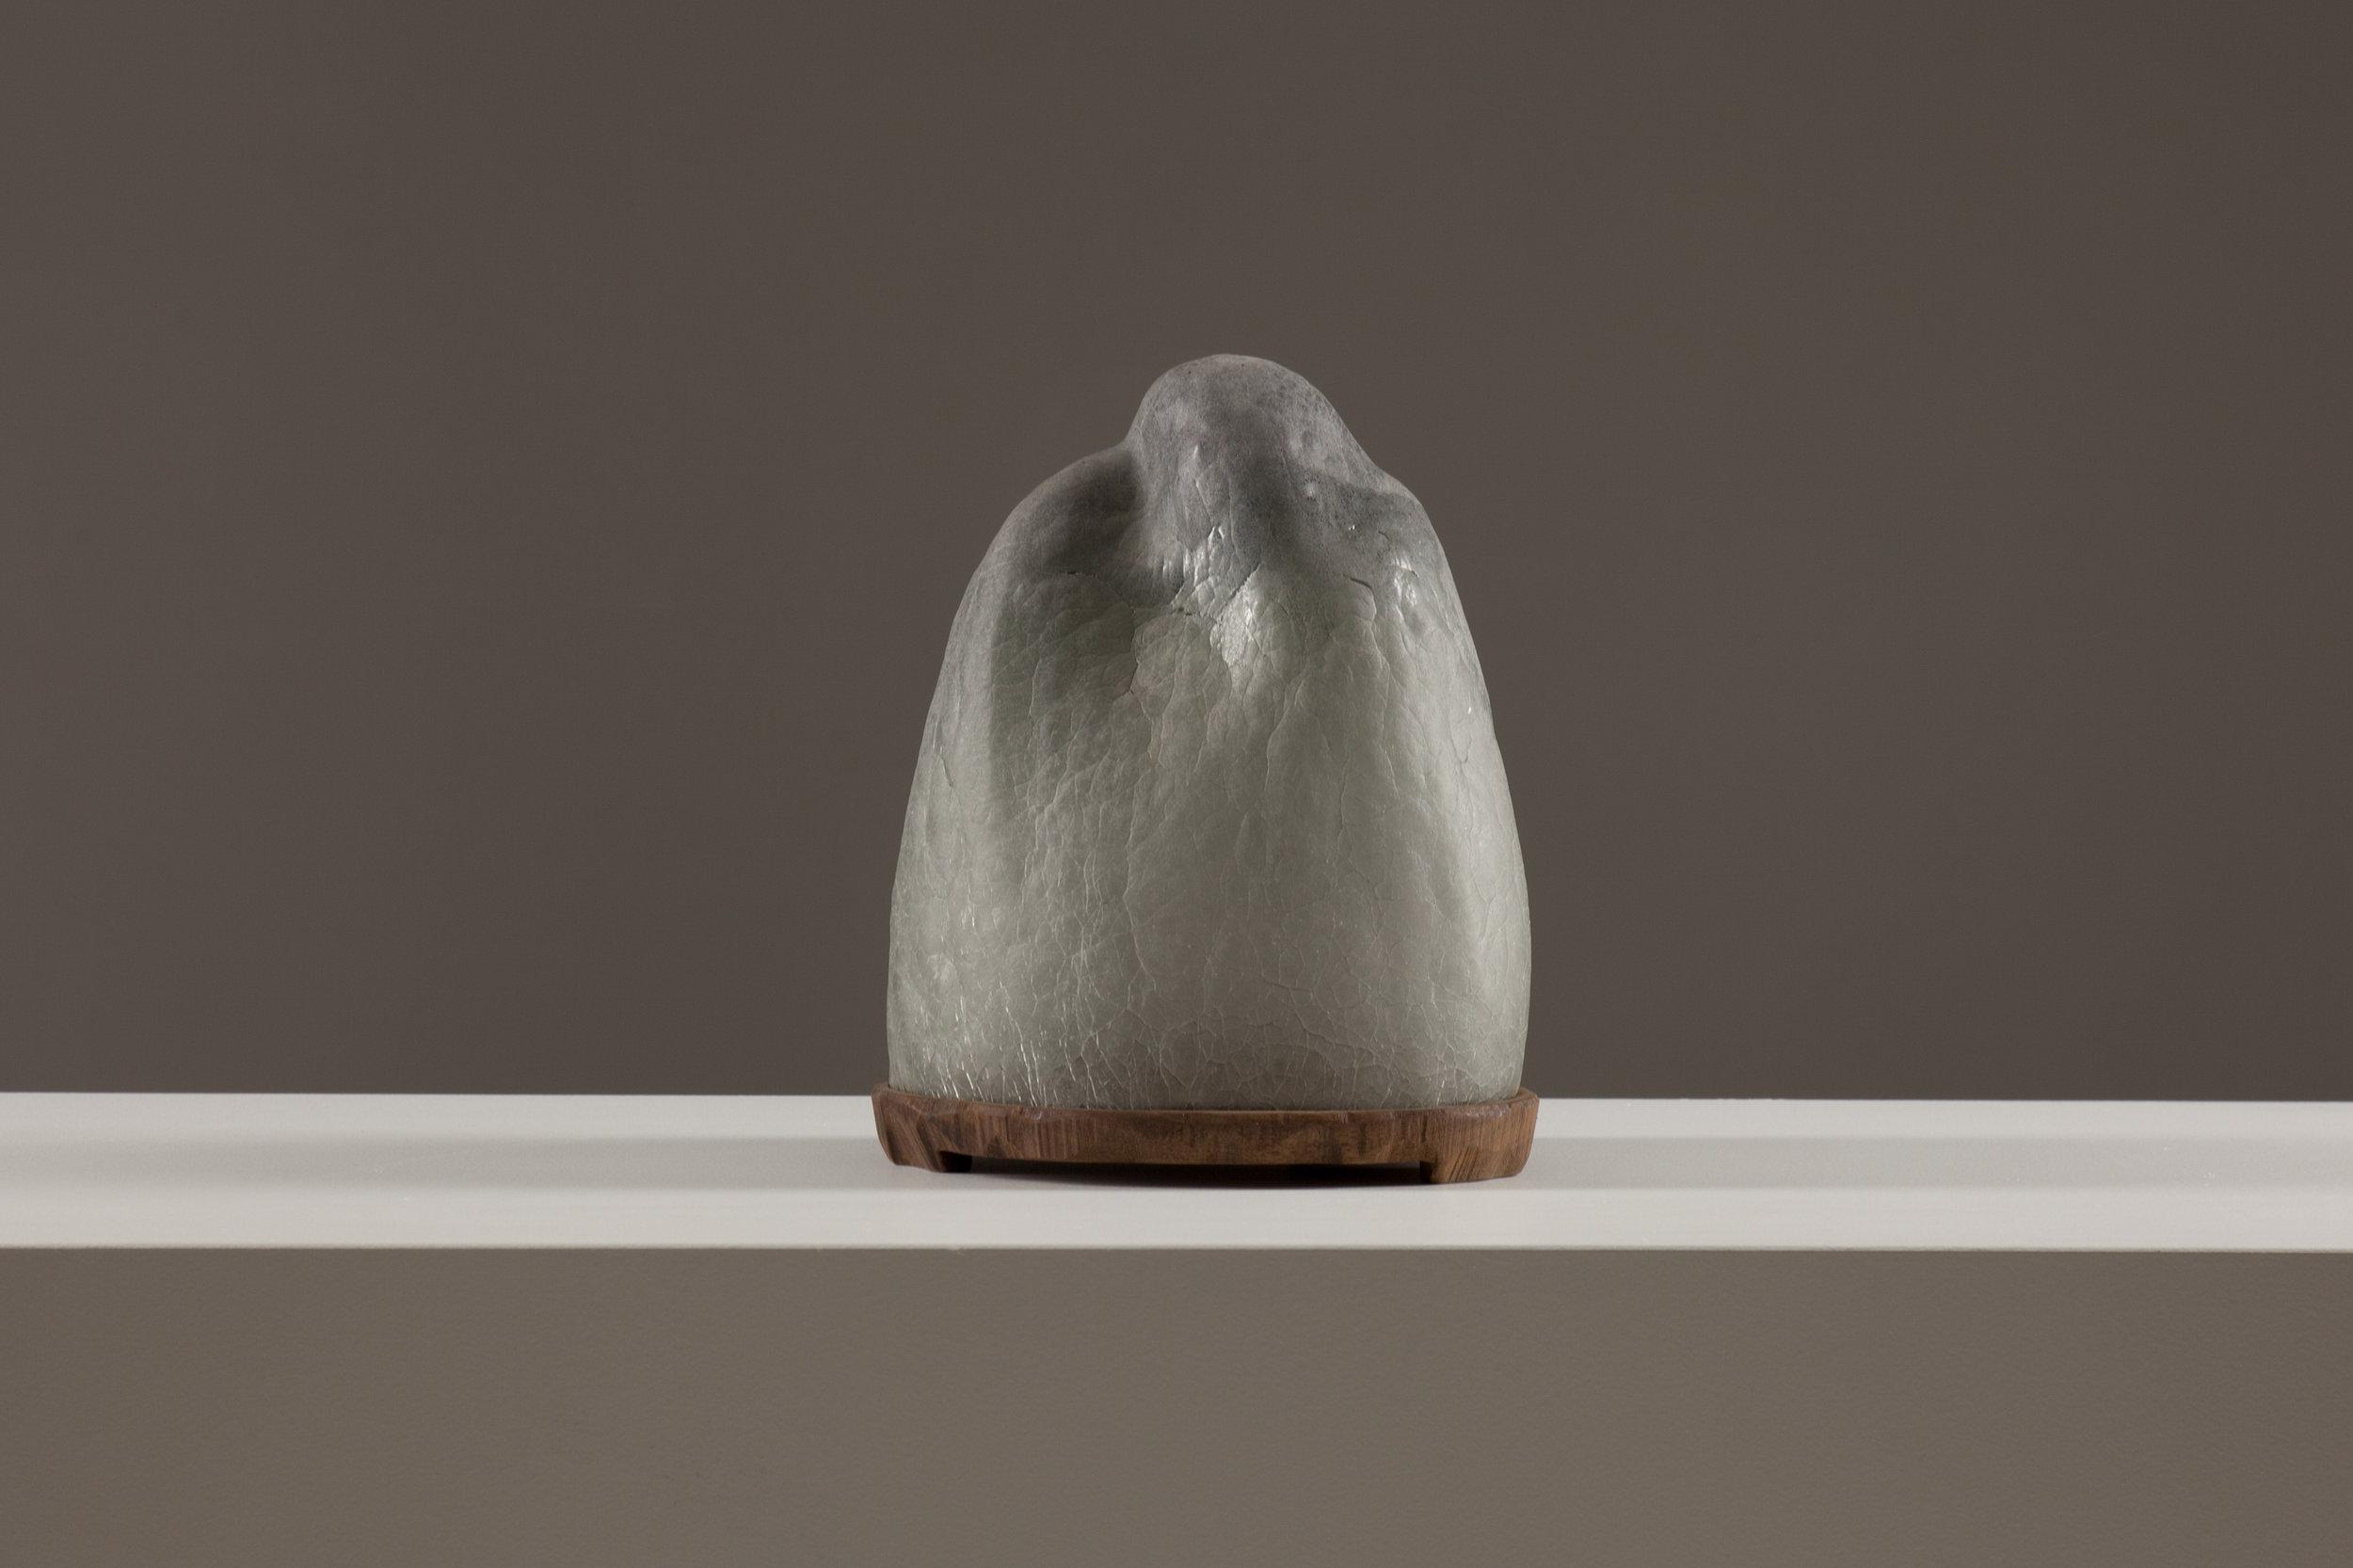 Tiny Mountain Table Object #2